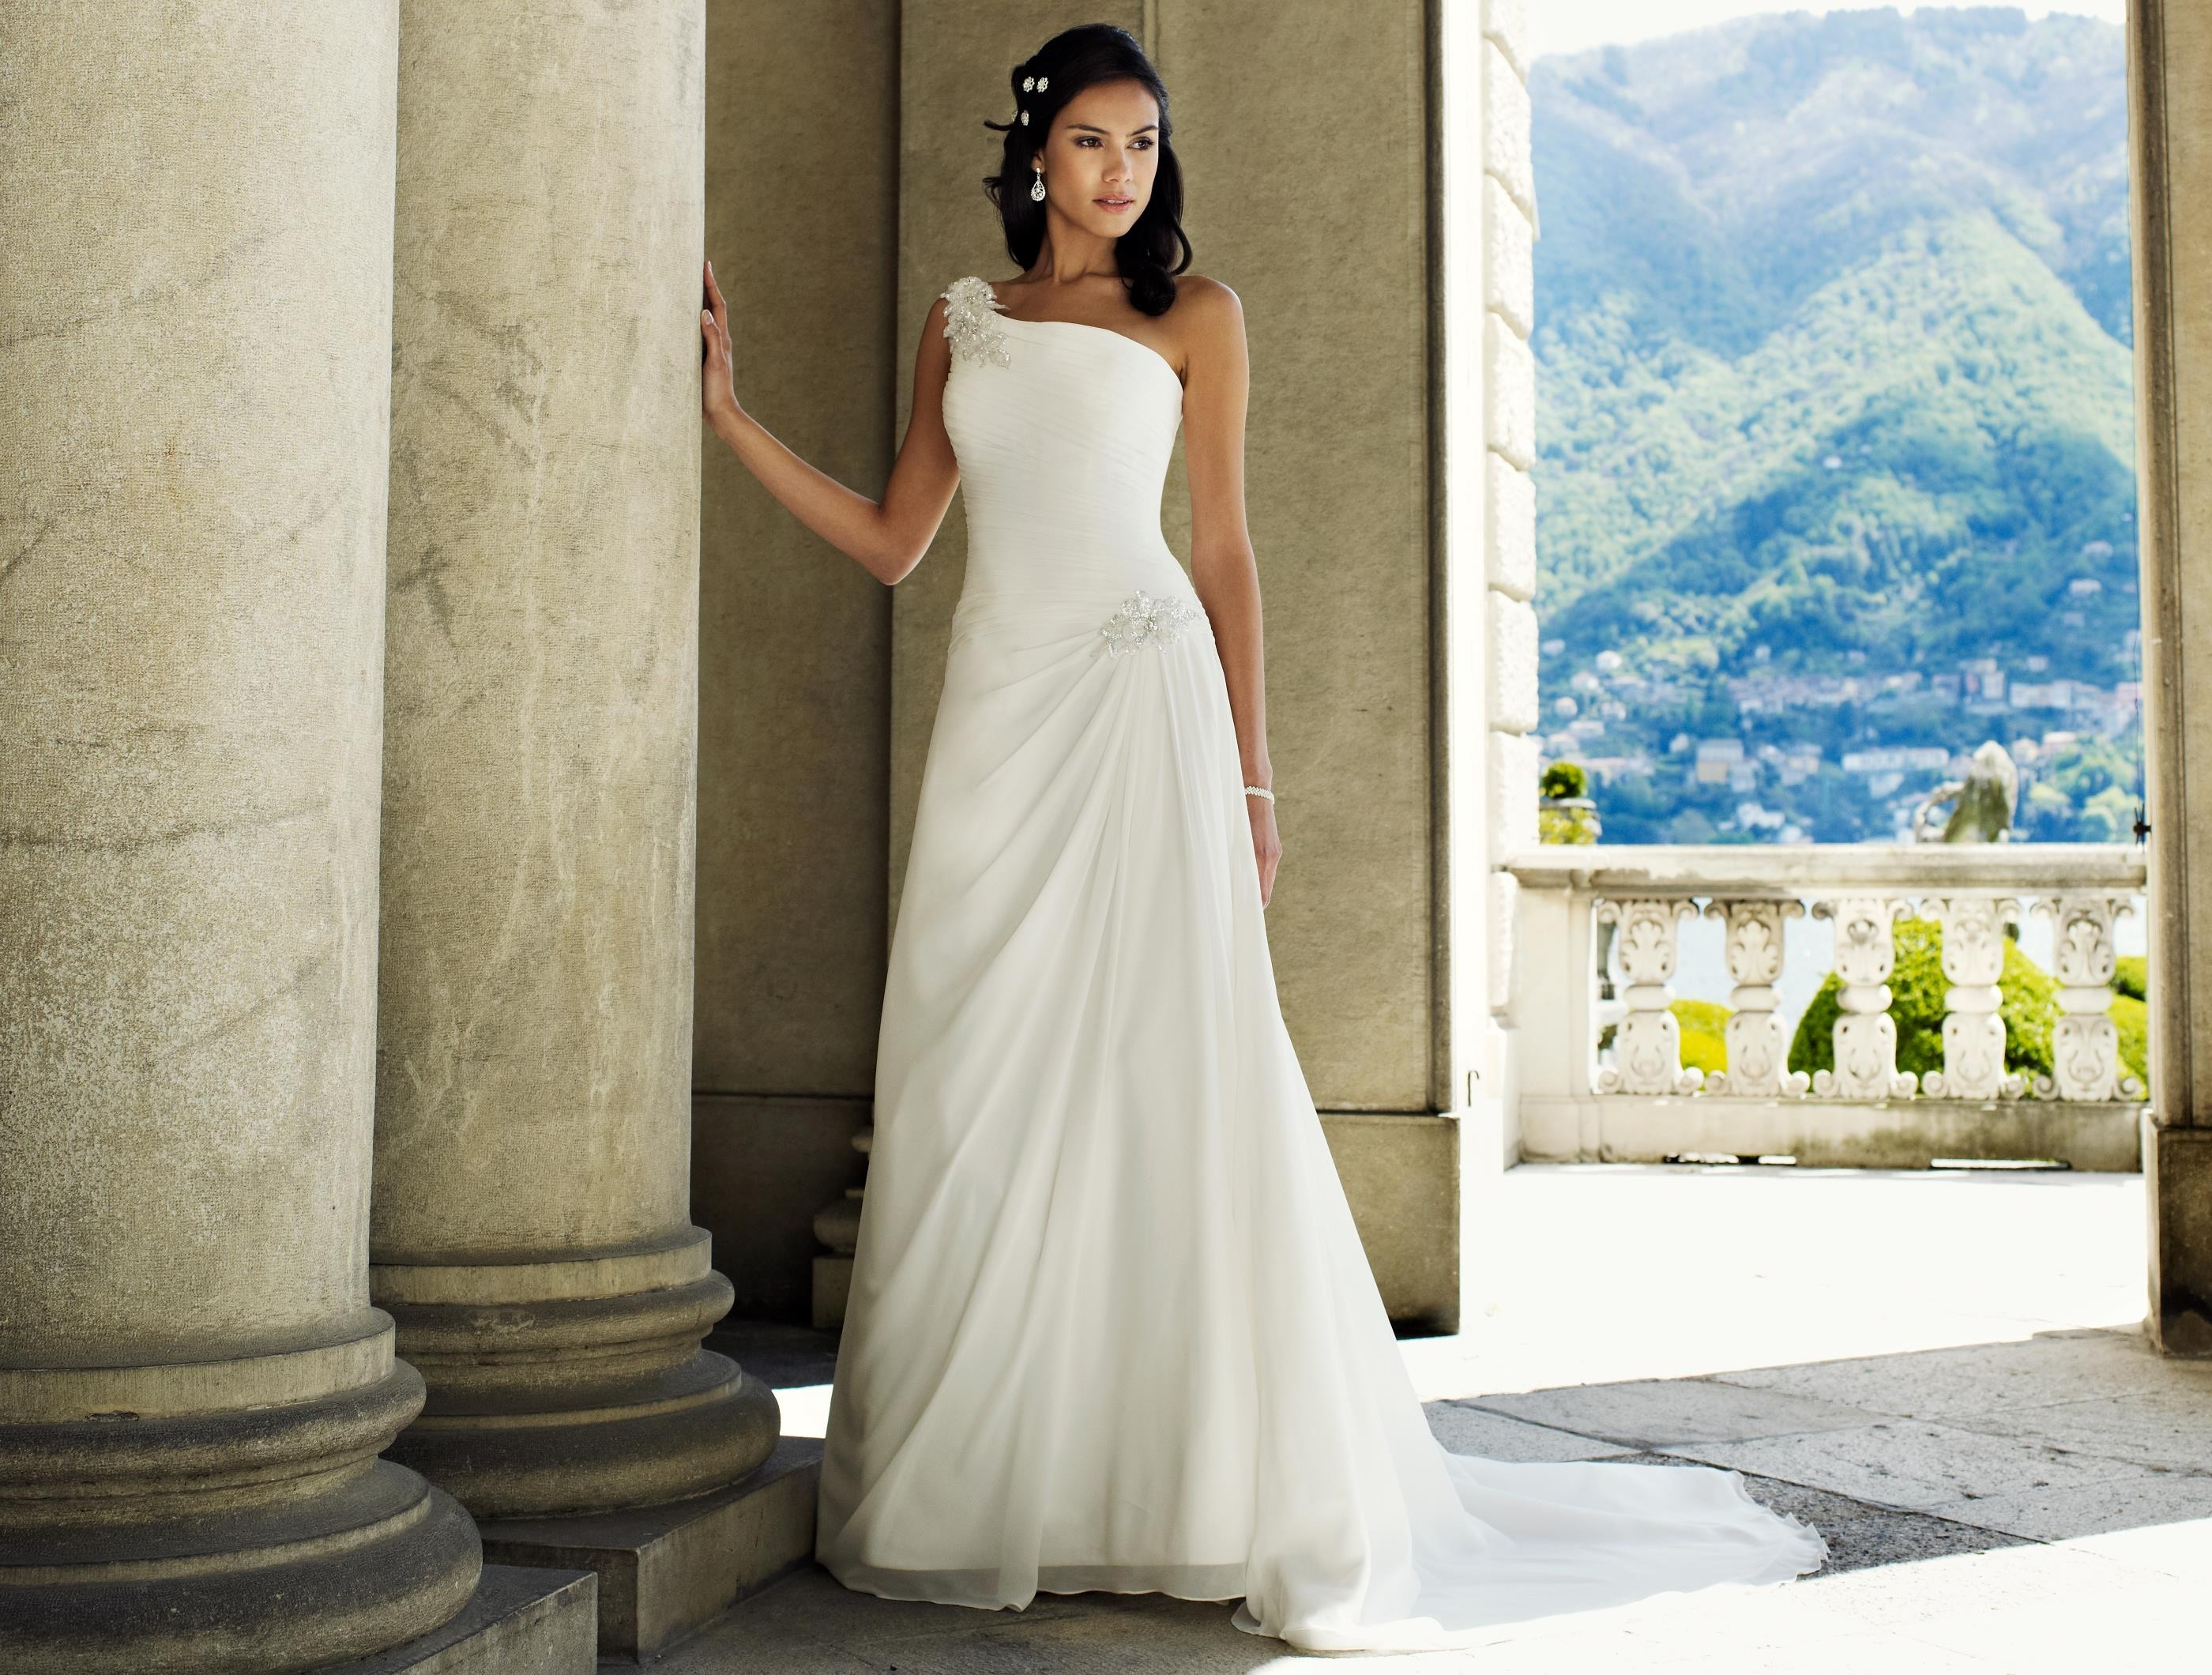 10 Großartig Brautkleid Mieten DesignDesigner Großartig Brautkleid Mieten Stylish